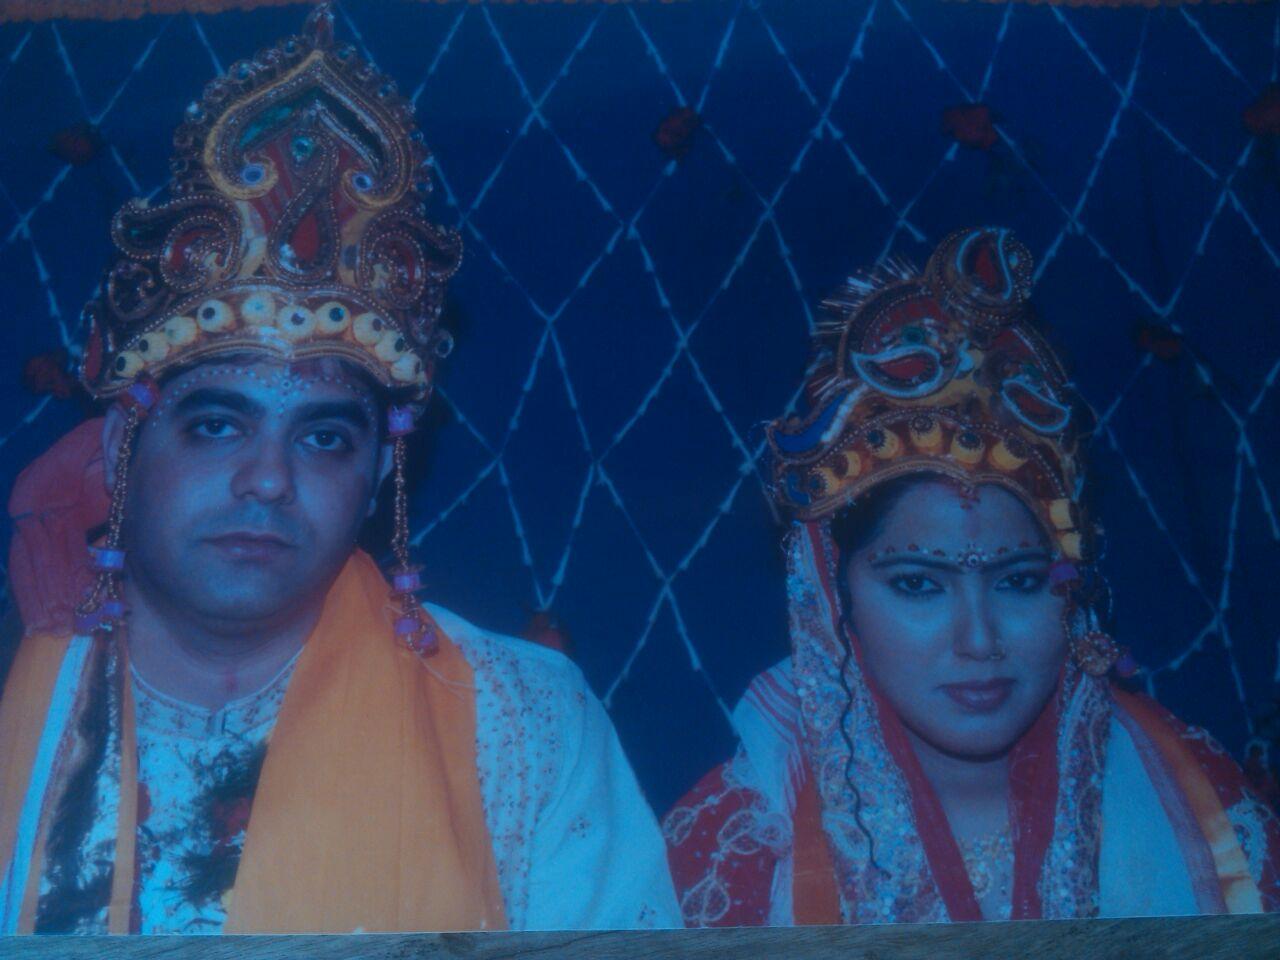 Sabyasachi Mishra and Lopamudra mishra